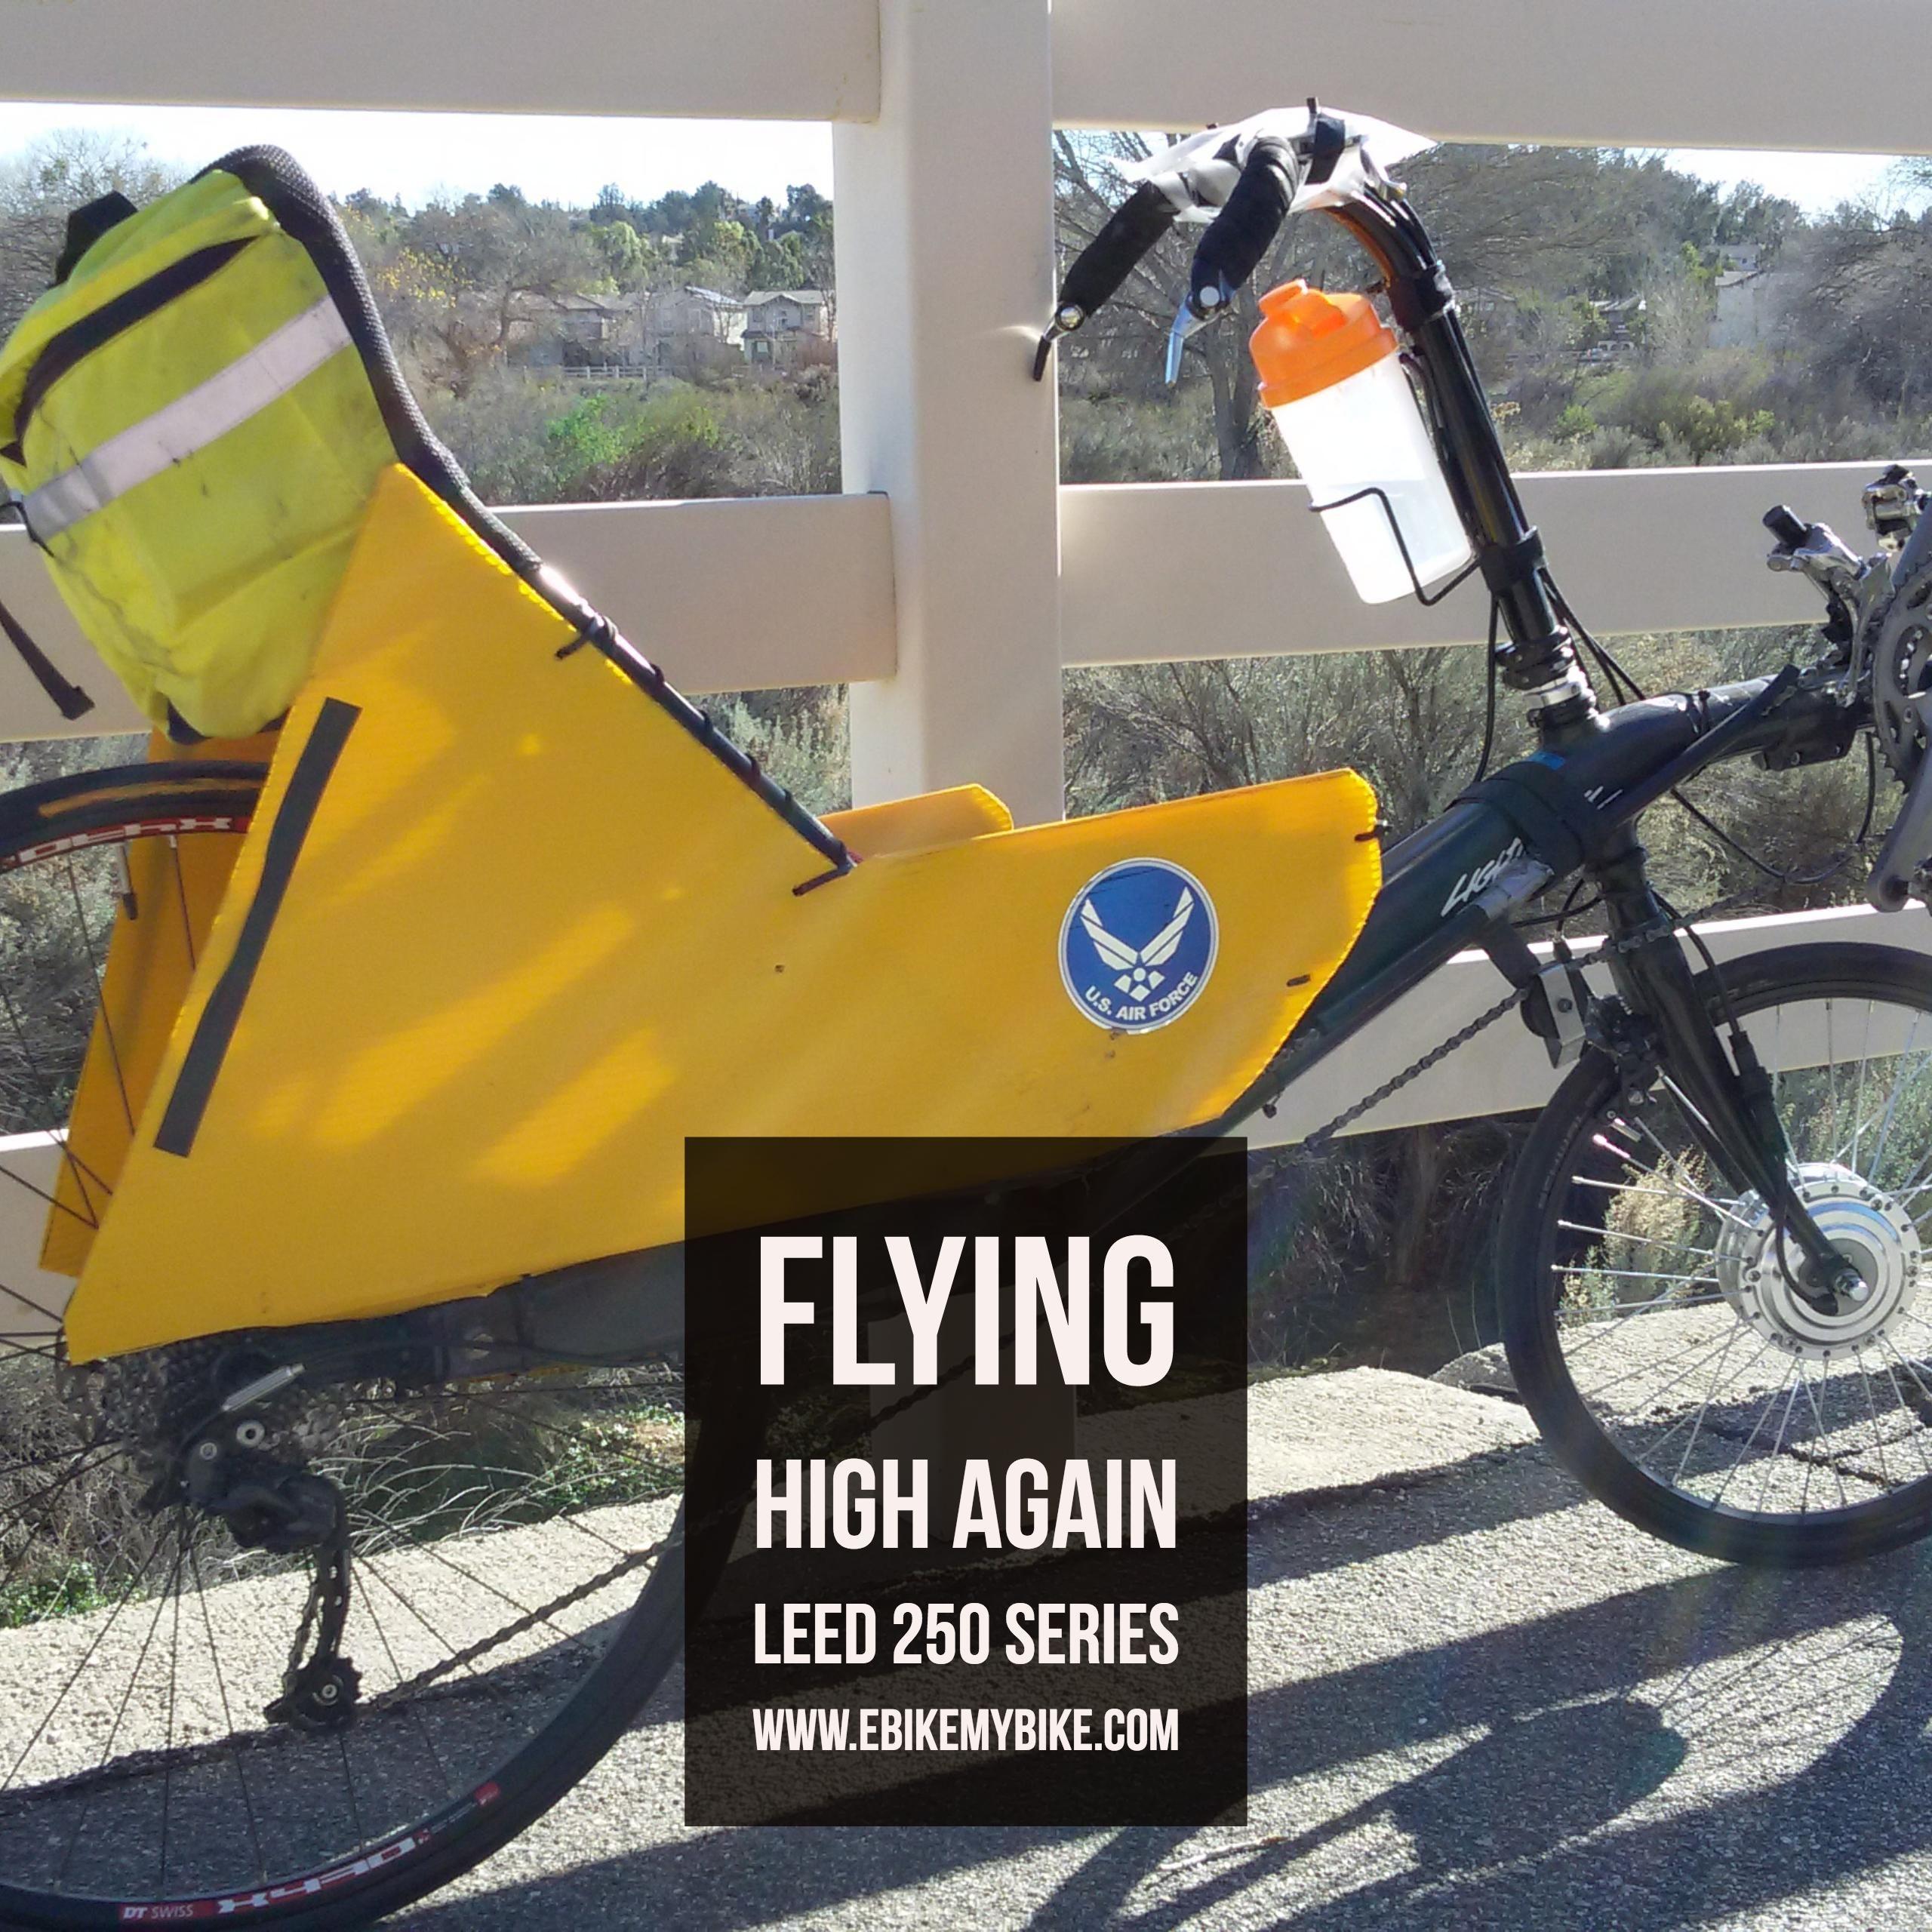 leed-electric-bike-kit-meme-31.jpg